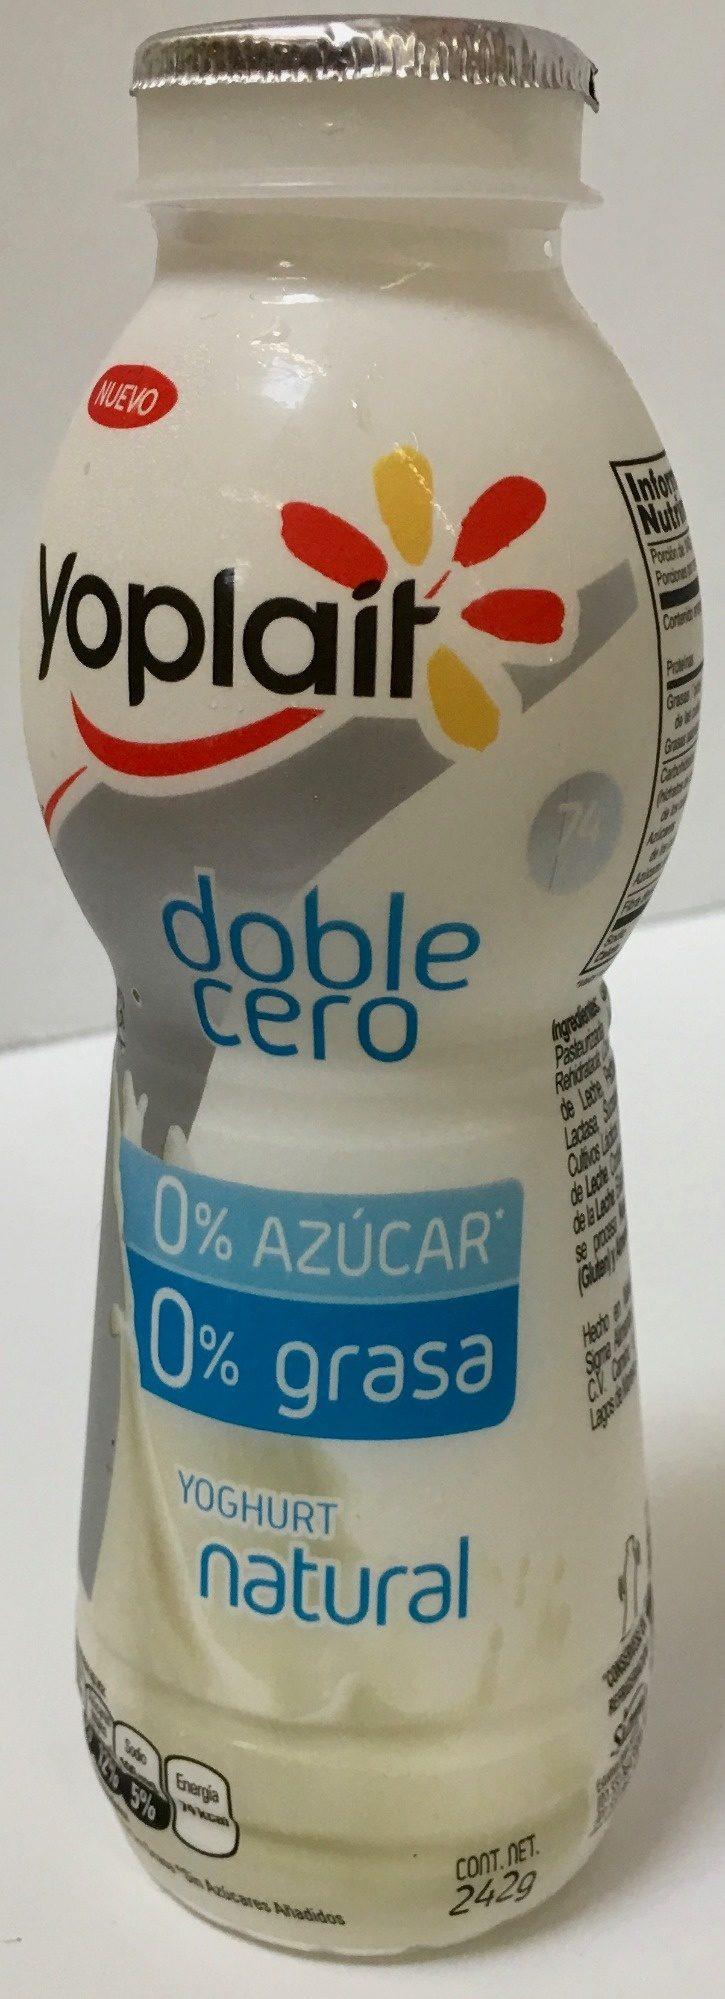 Yoplait doble cero - Natural - Producto - es